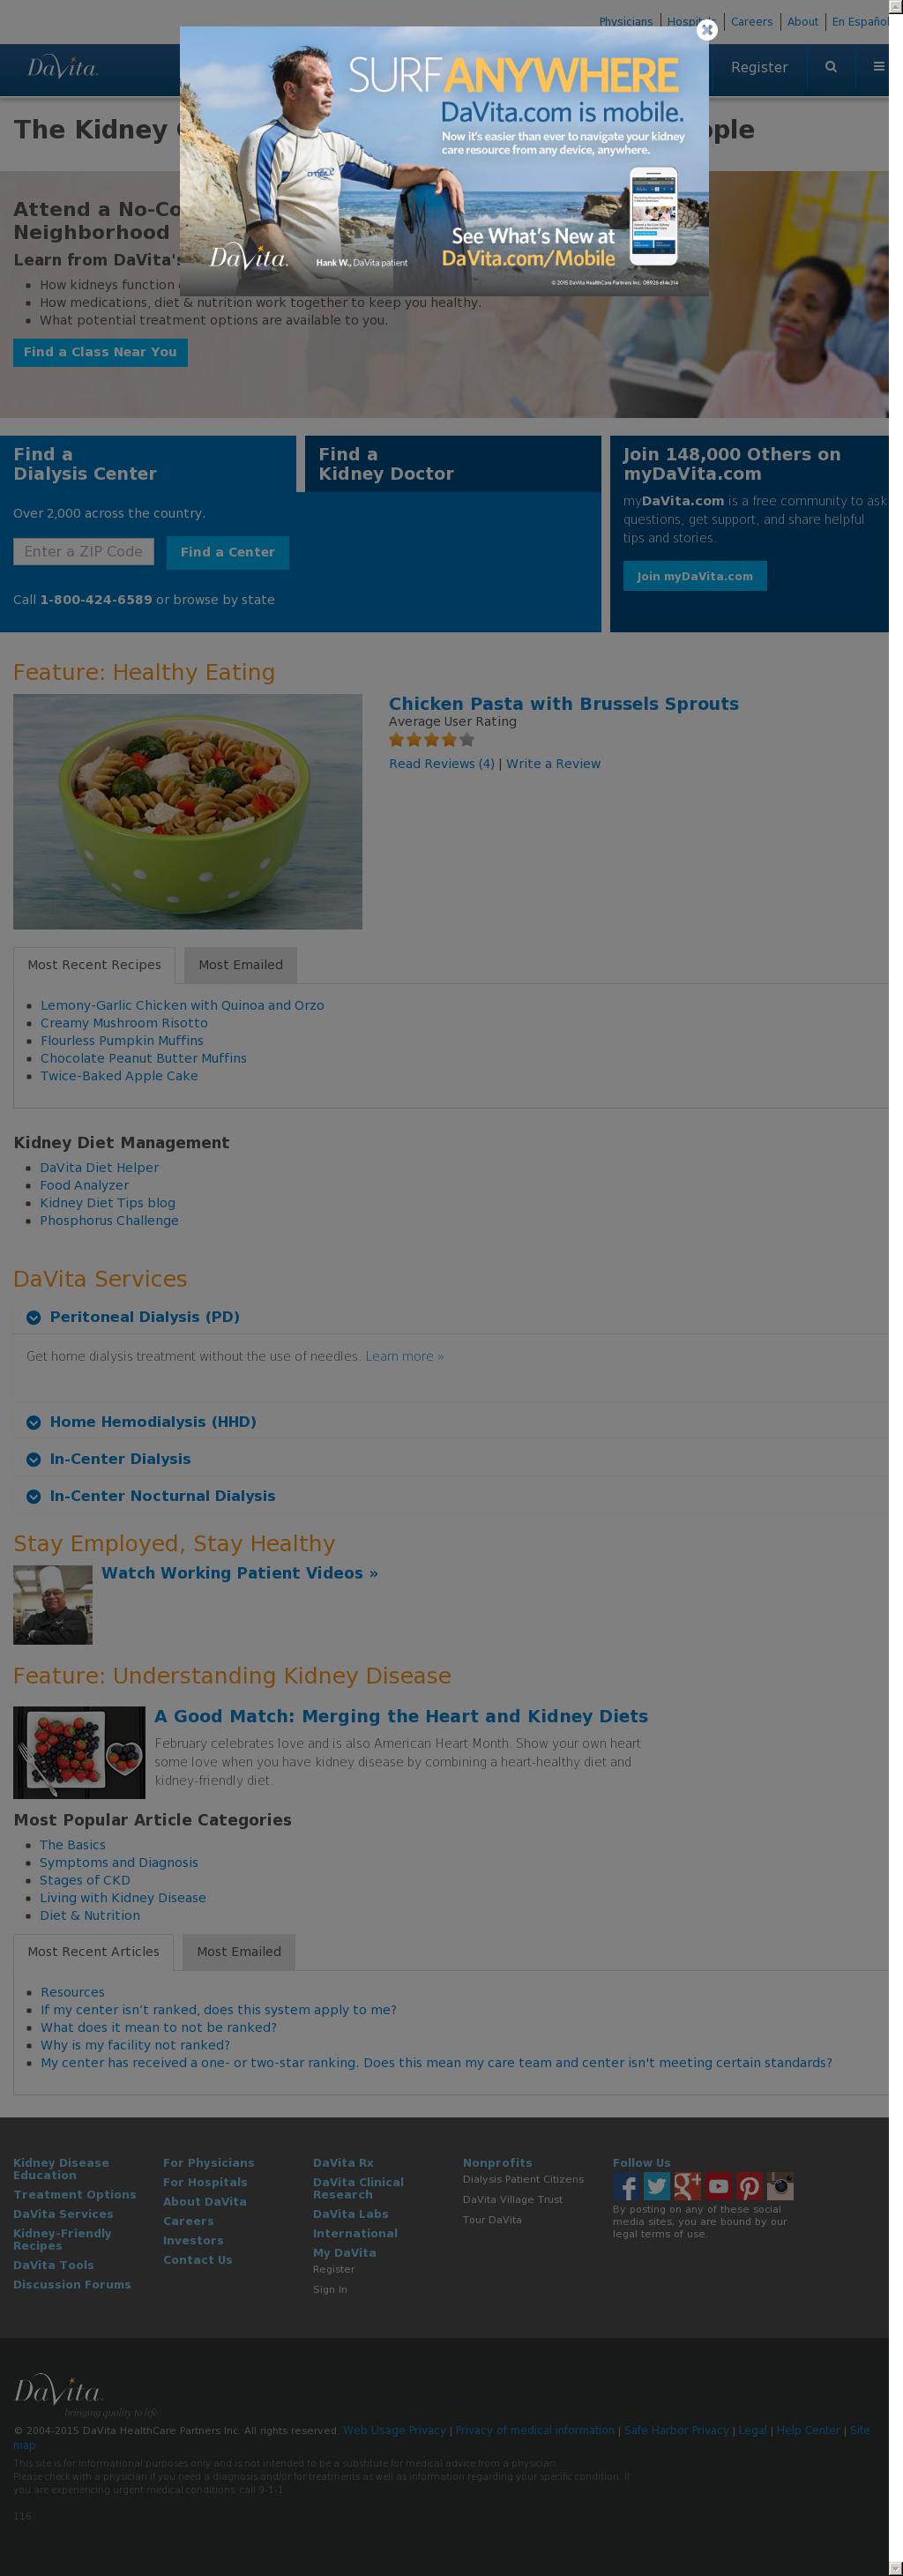 DaVita Competitors, Revenue and Employees - Owler Company